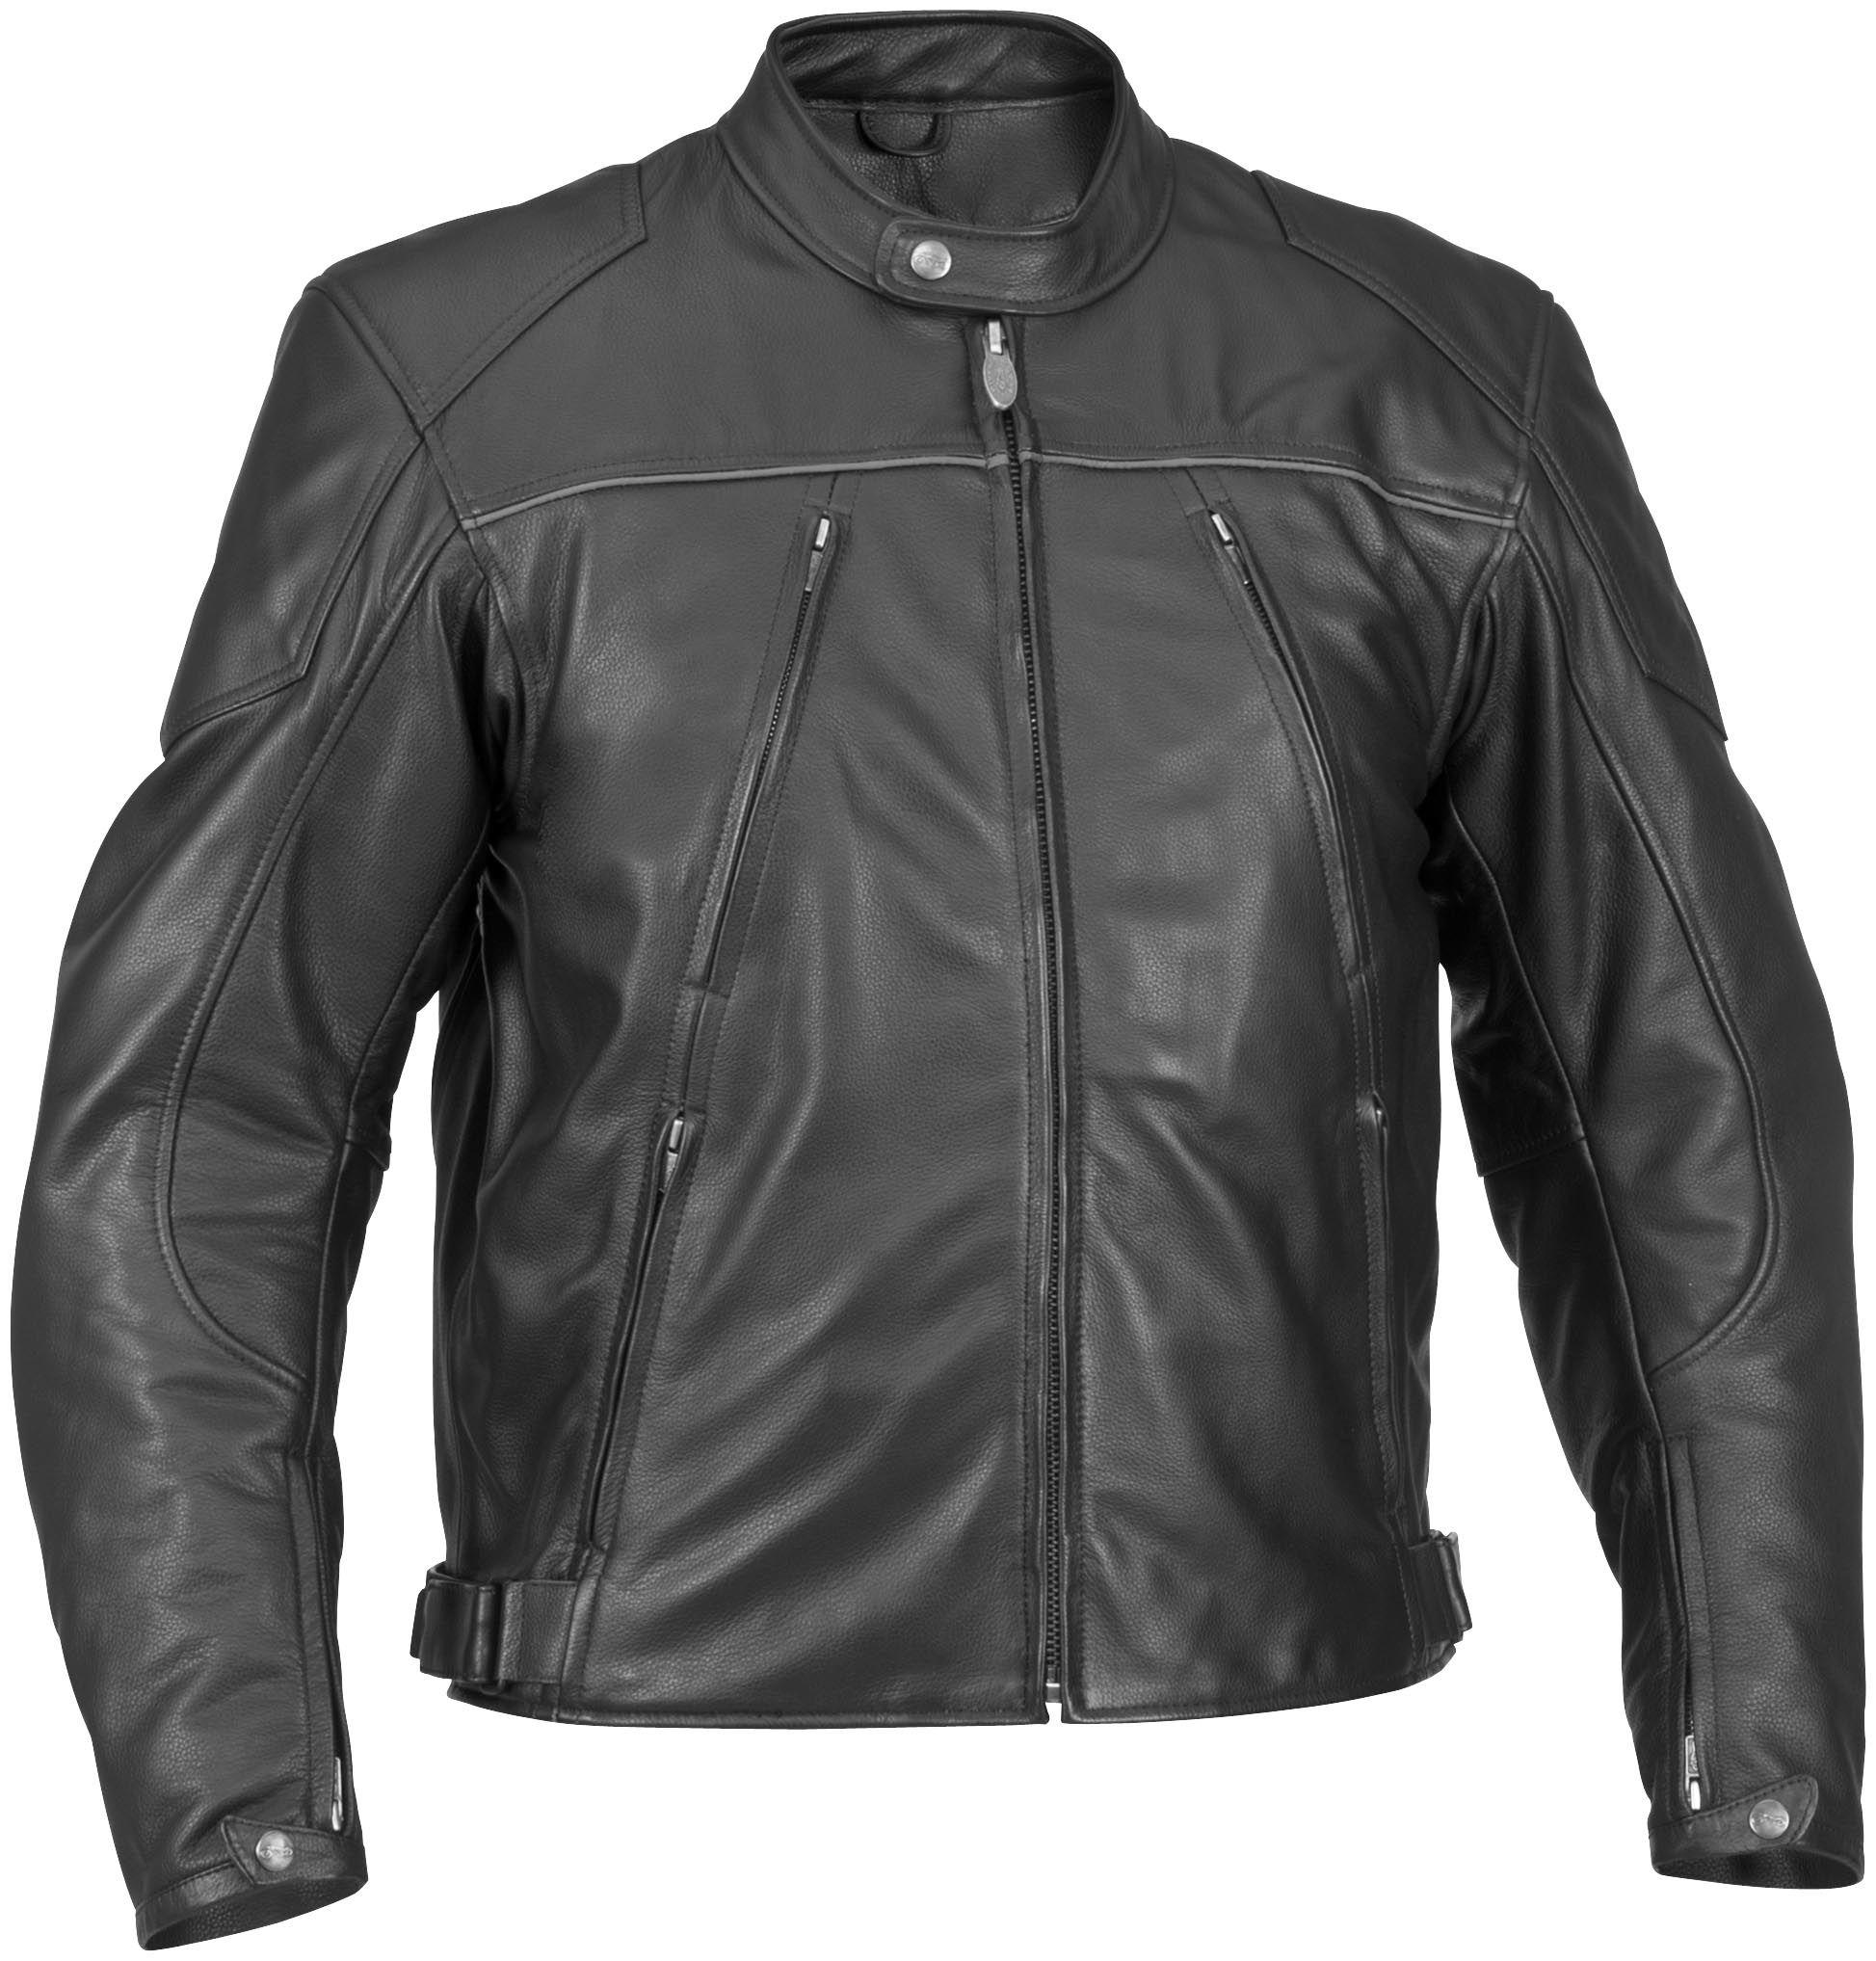 Mesa Leather Jacket for Men Motorcycle jacket